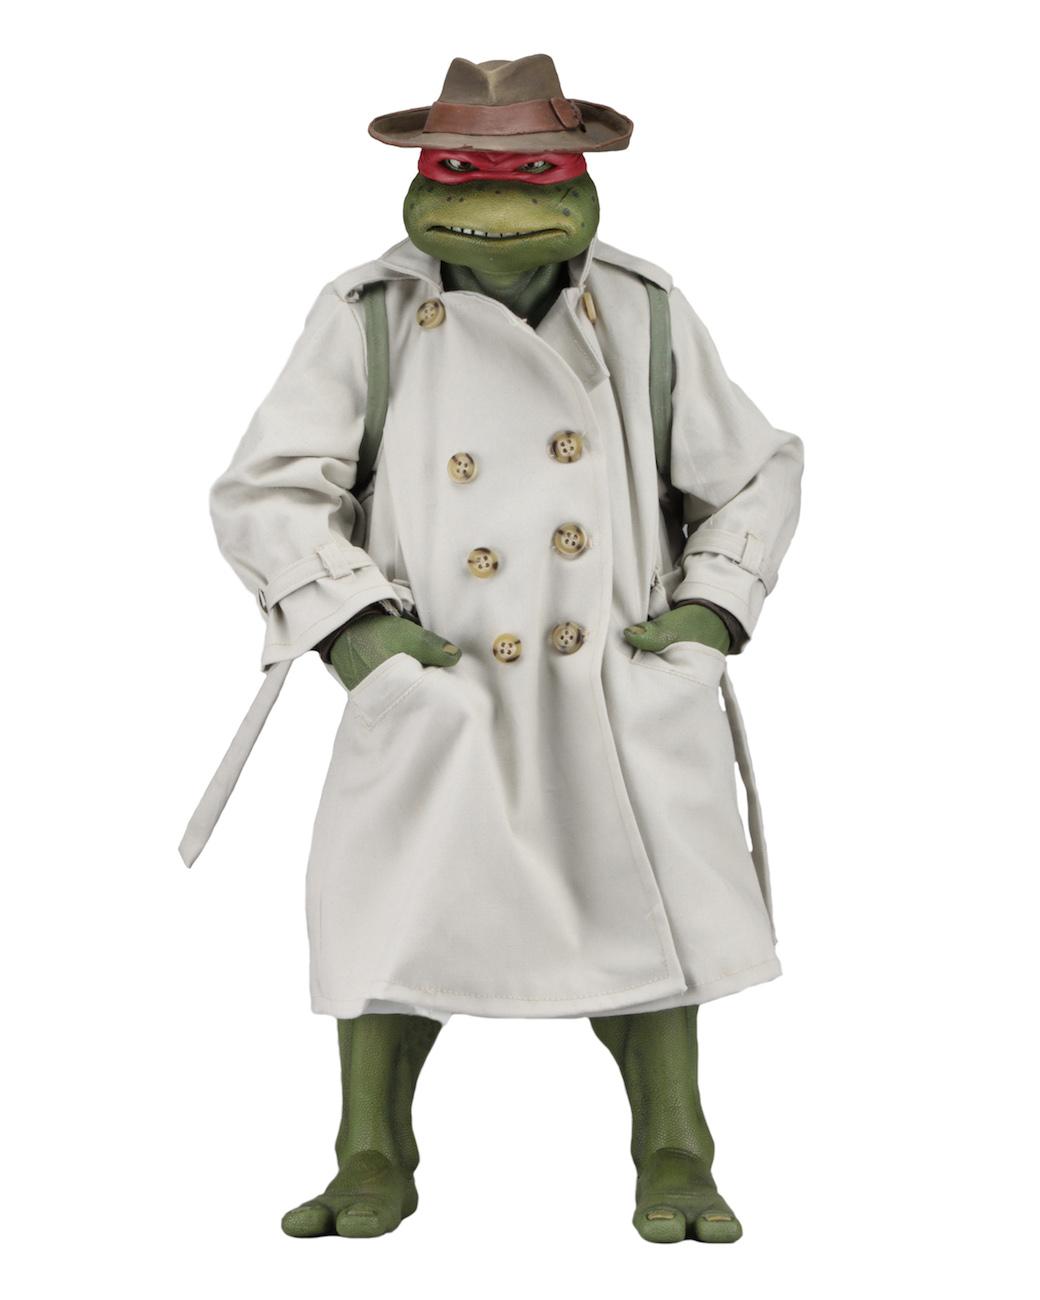 NECA-TMNT-Disguise-Raphael-001